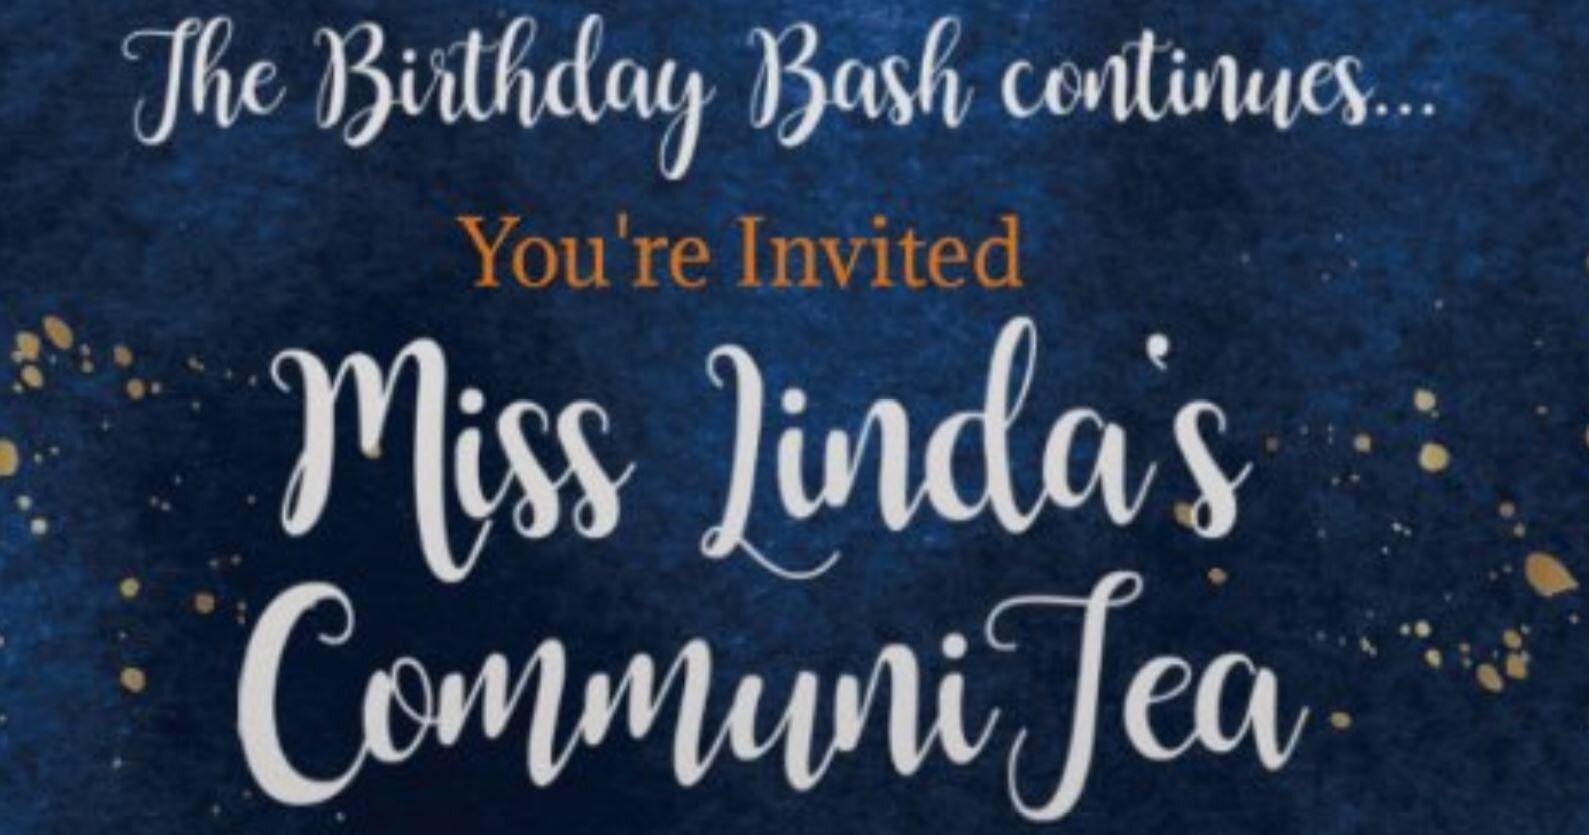 A special event celebrating womanhood   Saturday, November 30, 2019  2:00pm - 4:00pm